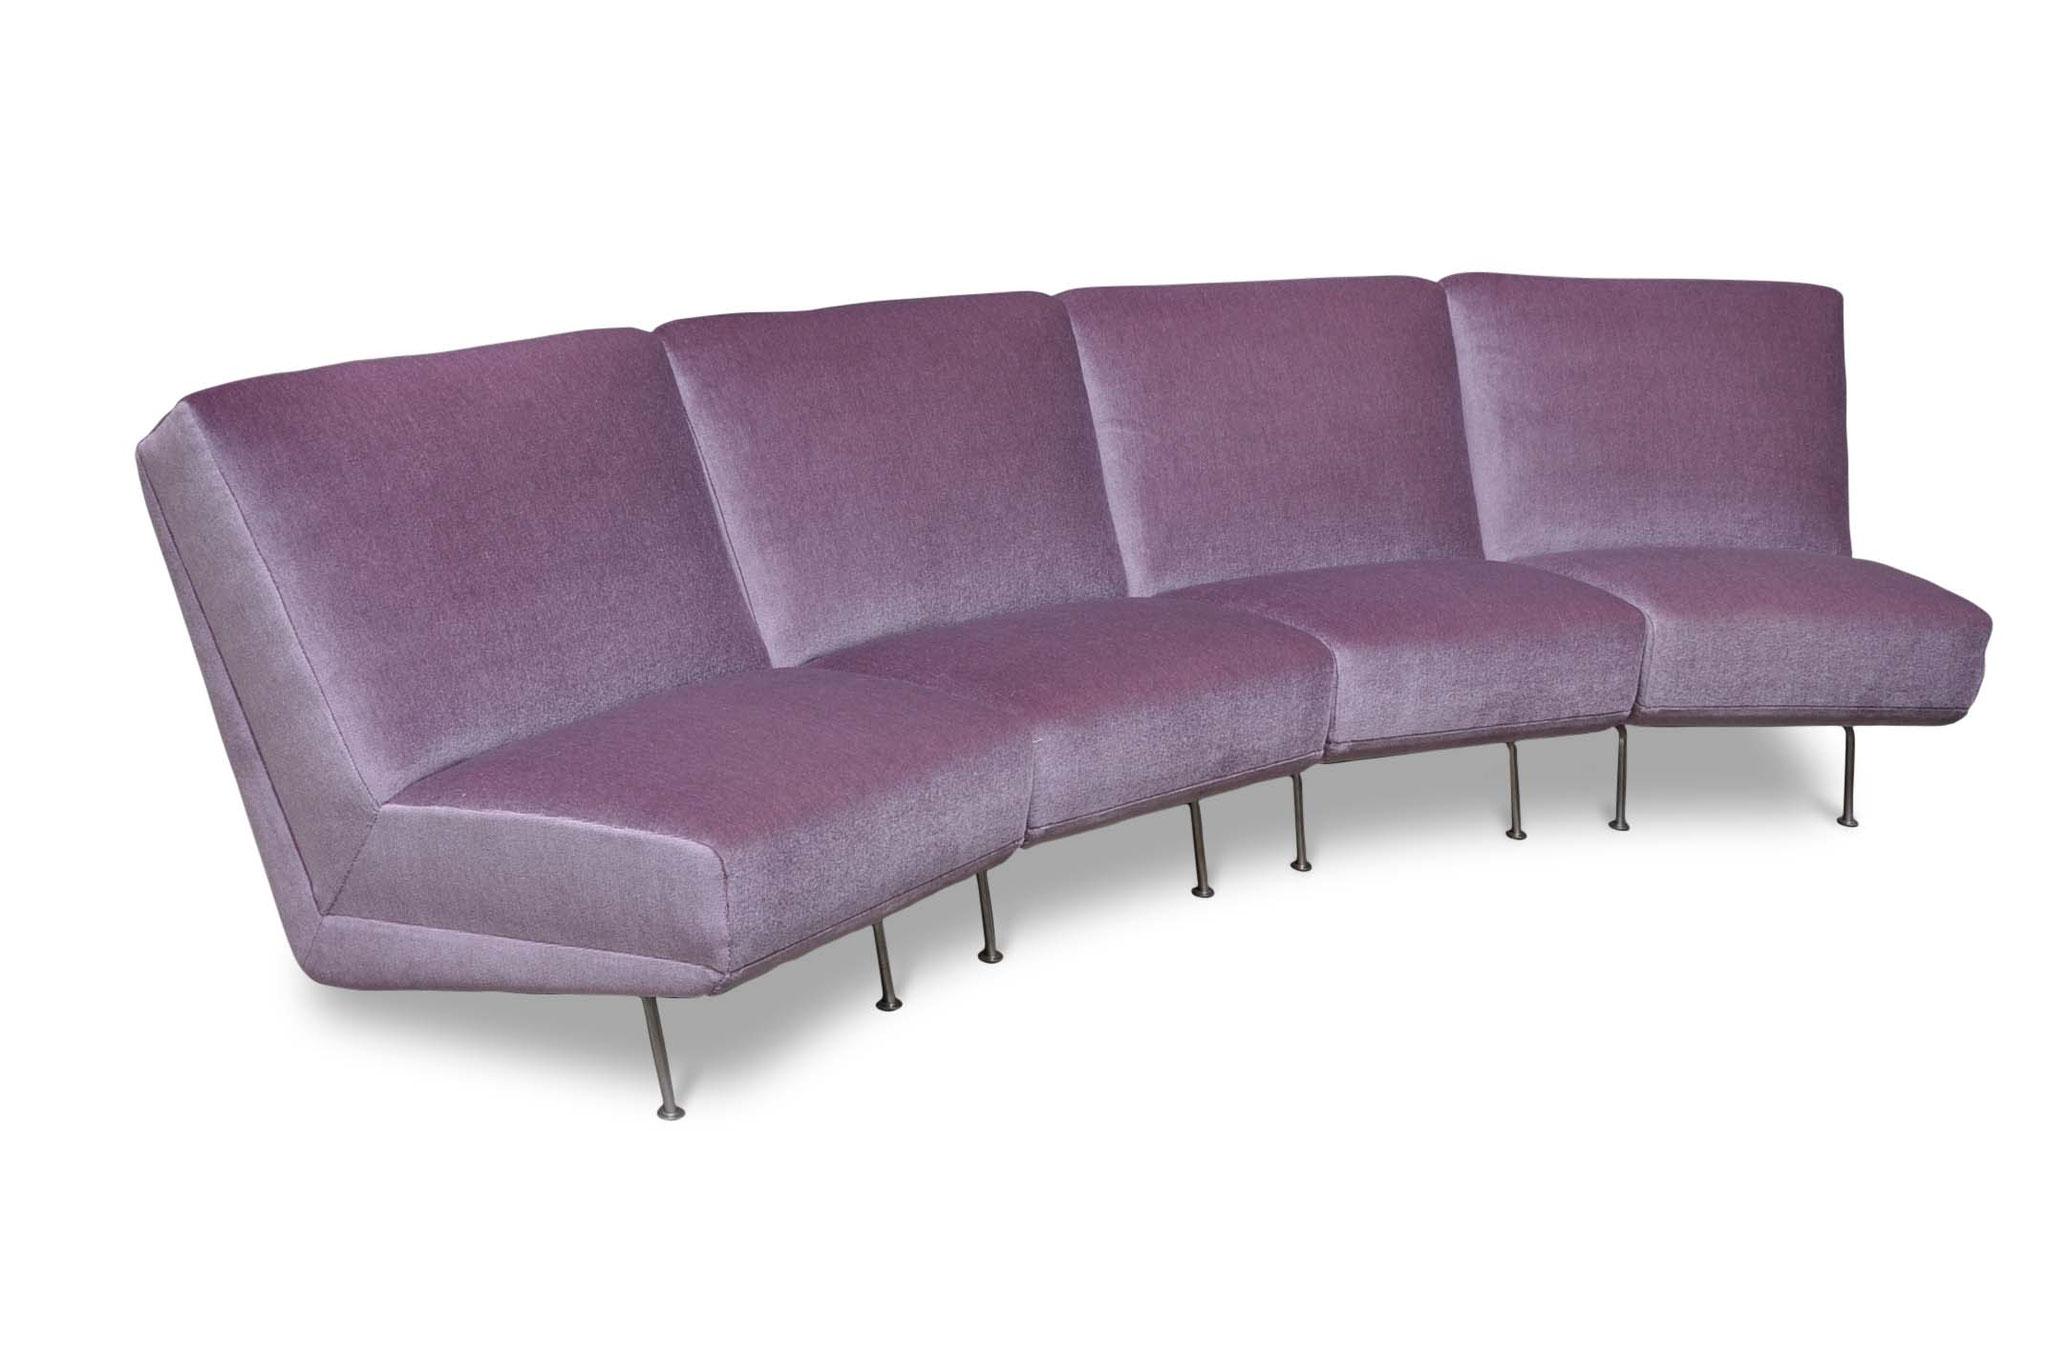 artifort theo ruth sectional sofa